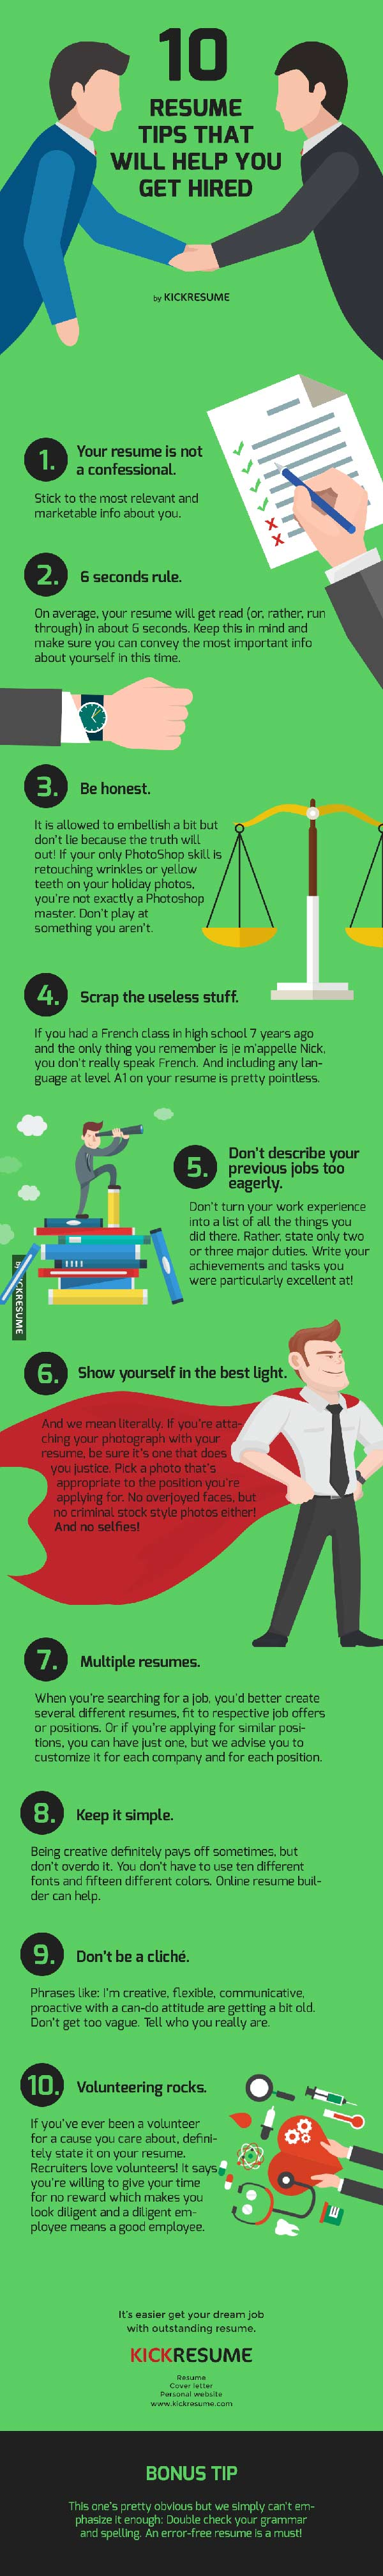 10-interview-tips_kickresume